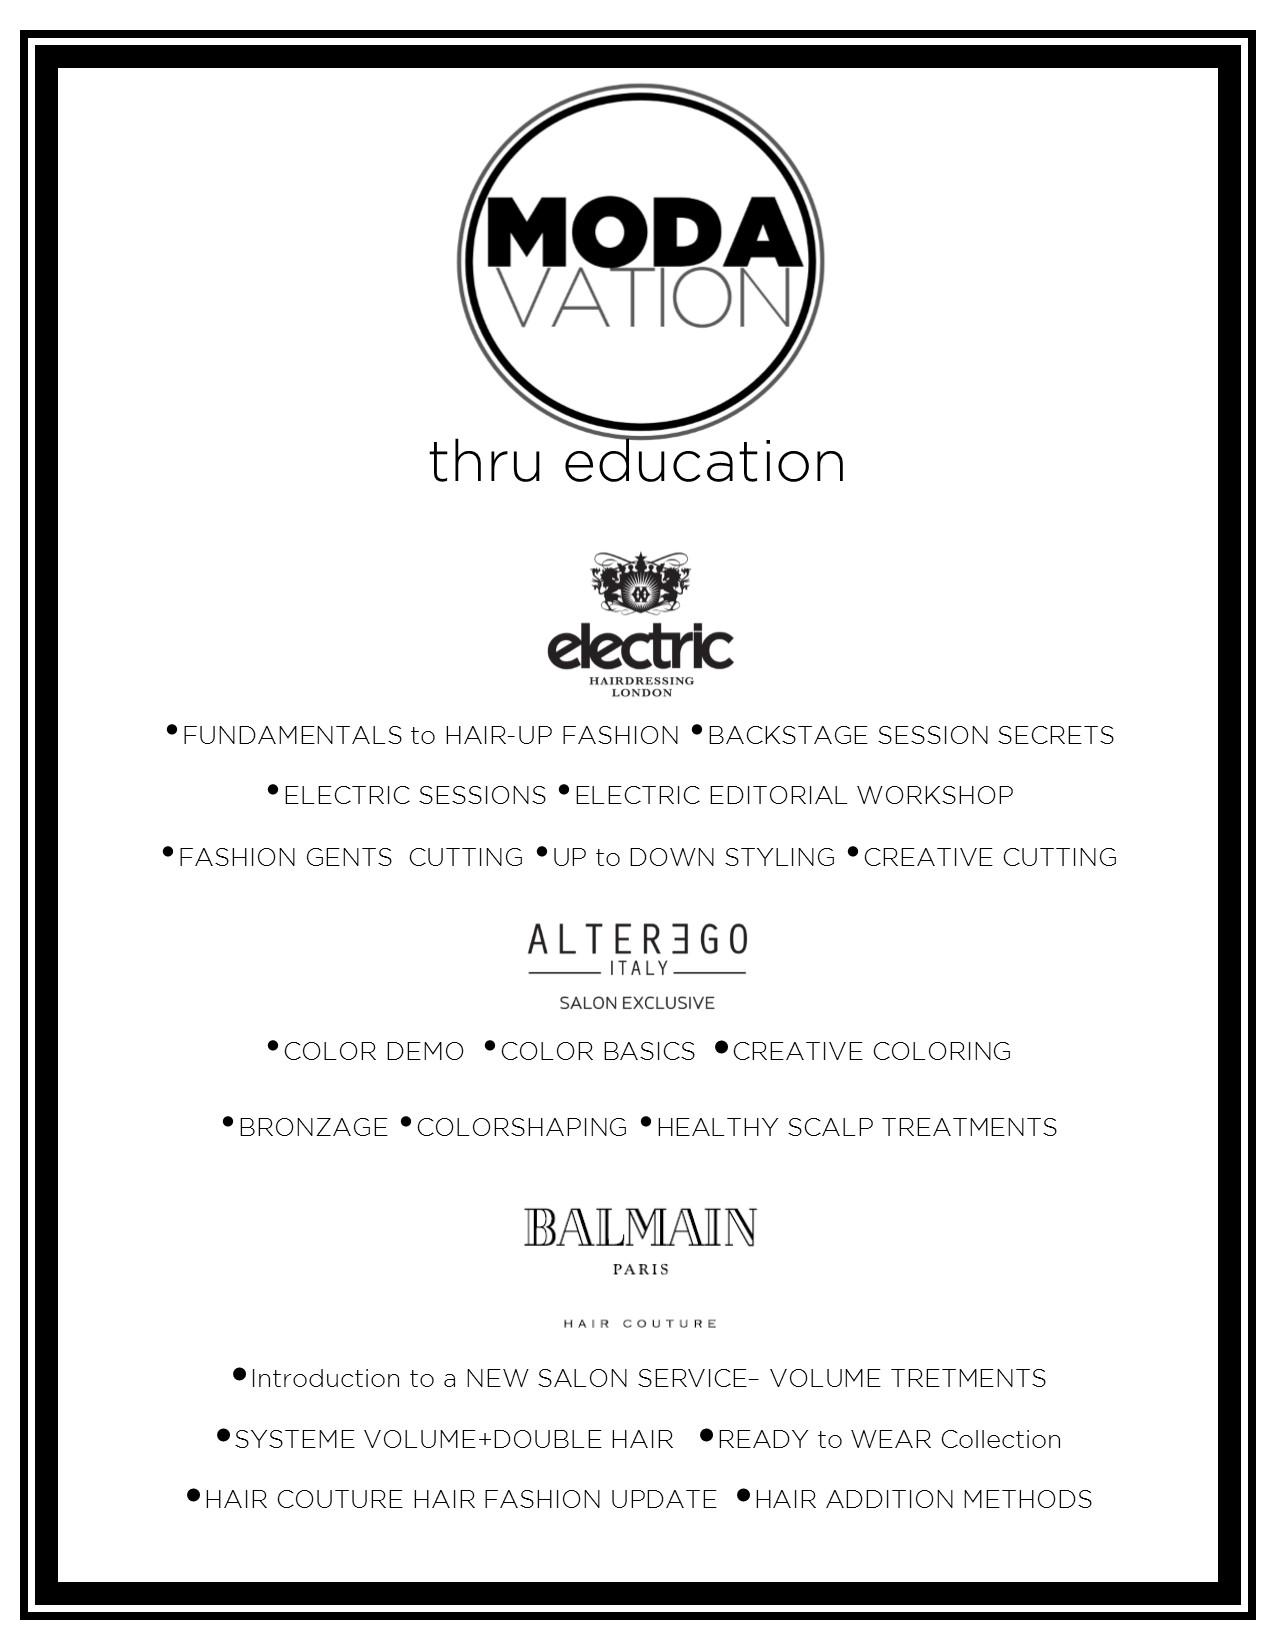 modavation-eductaion